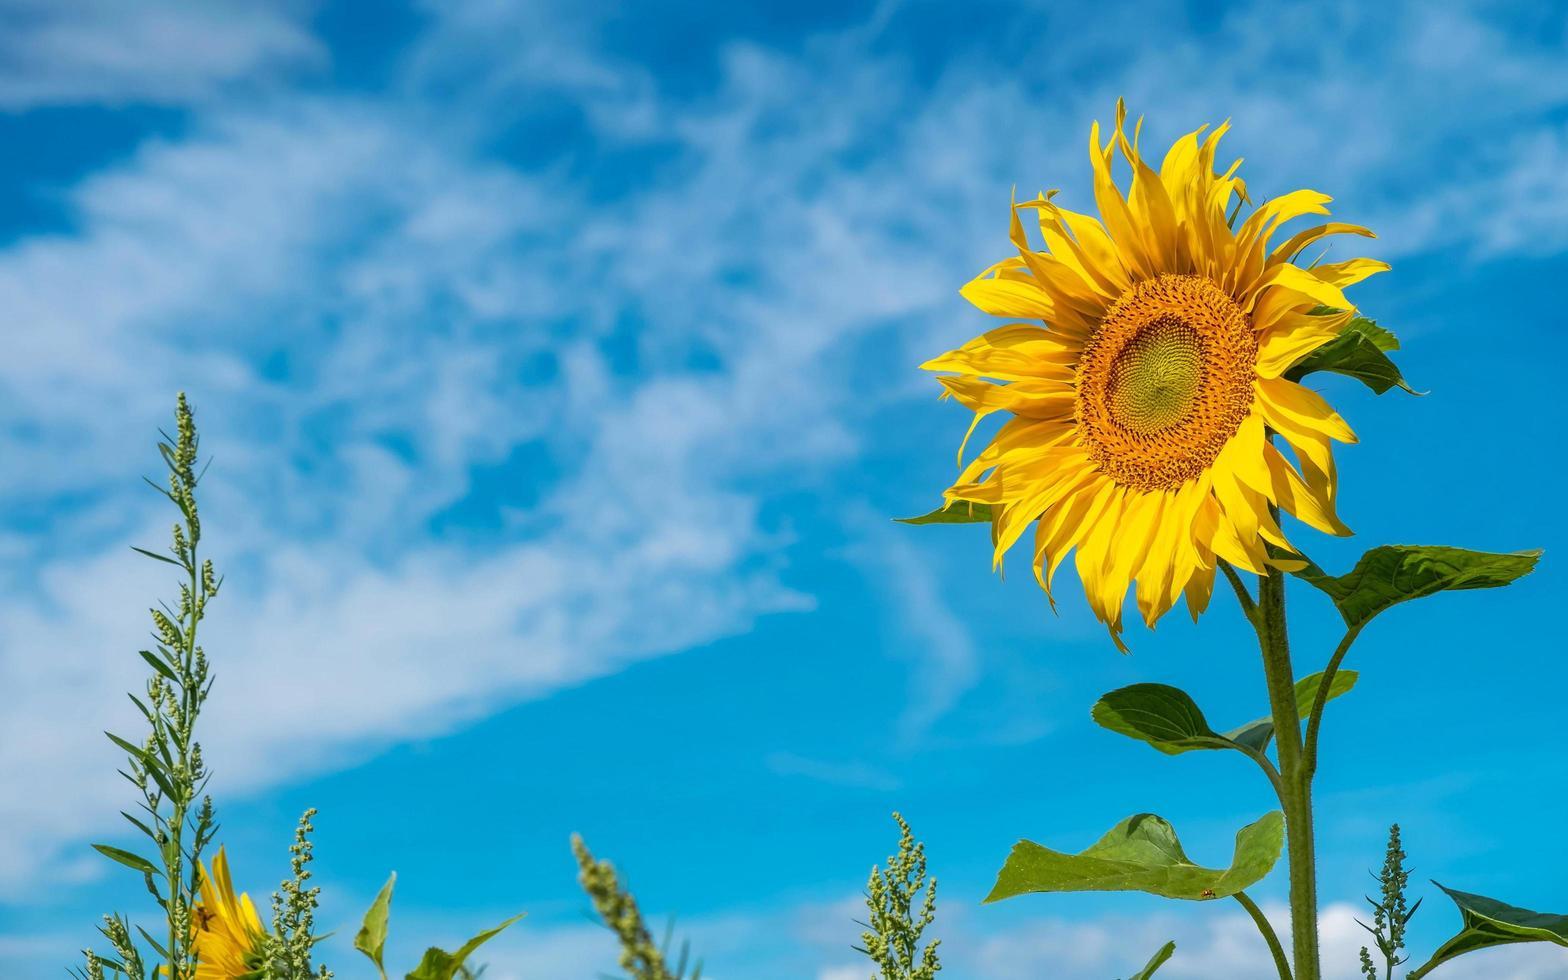 Sunflower in field photo